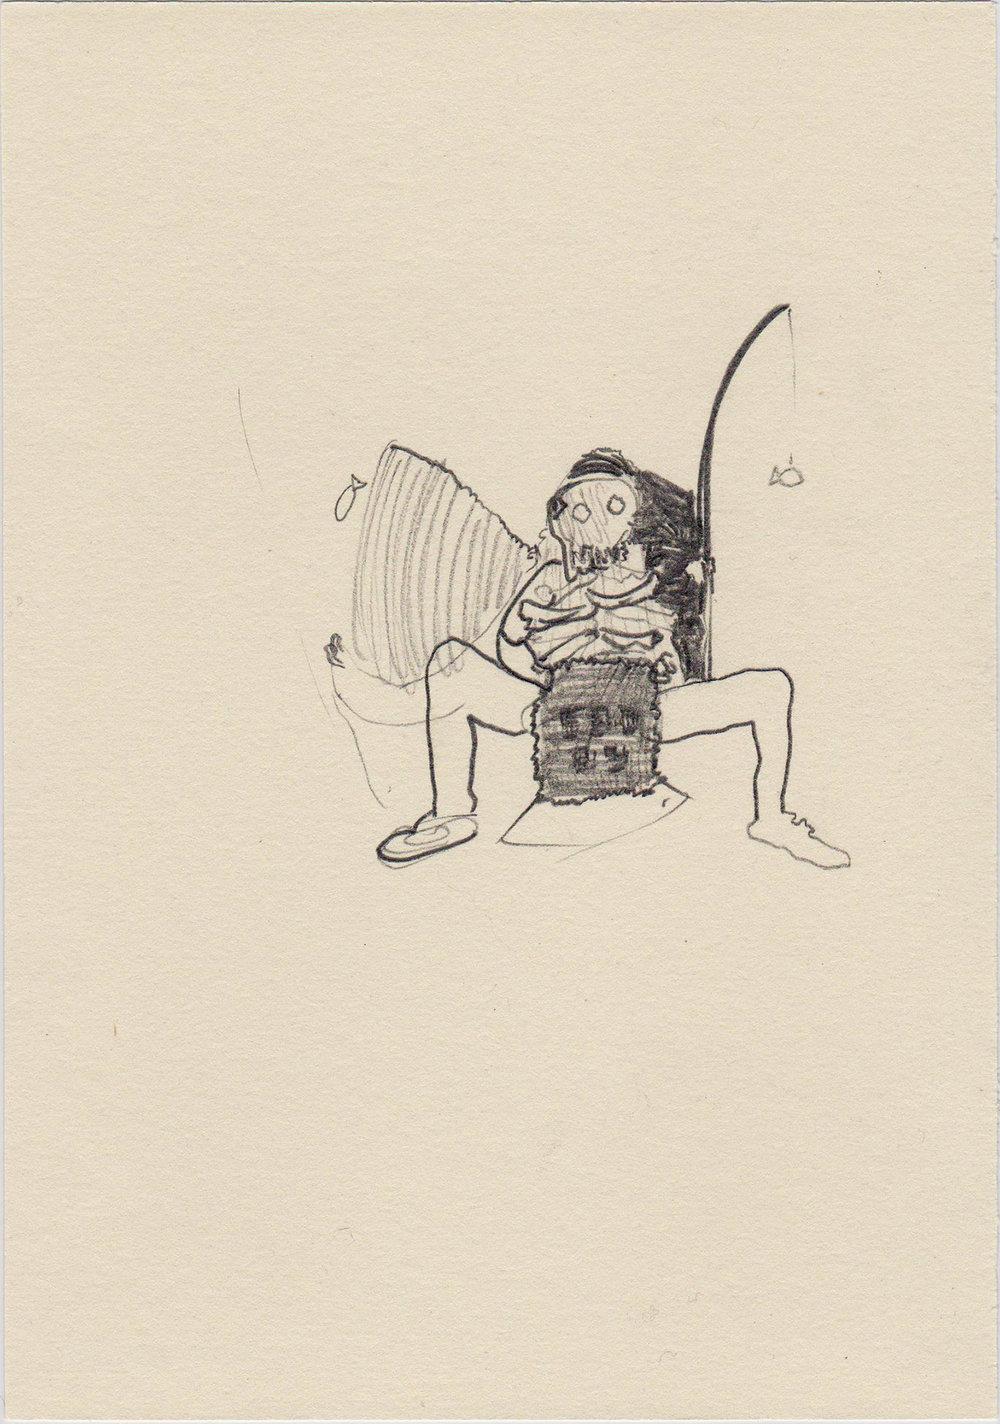 Monolithic, 2015; Pencil on paper; 20 x 14,5 cm